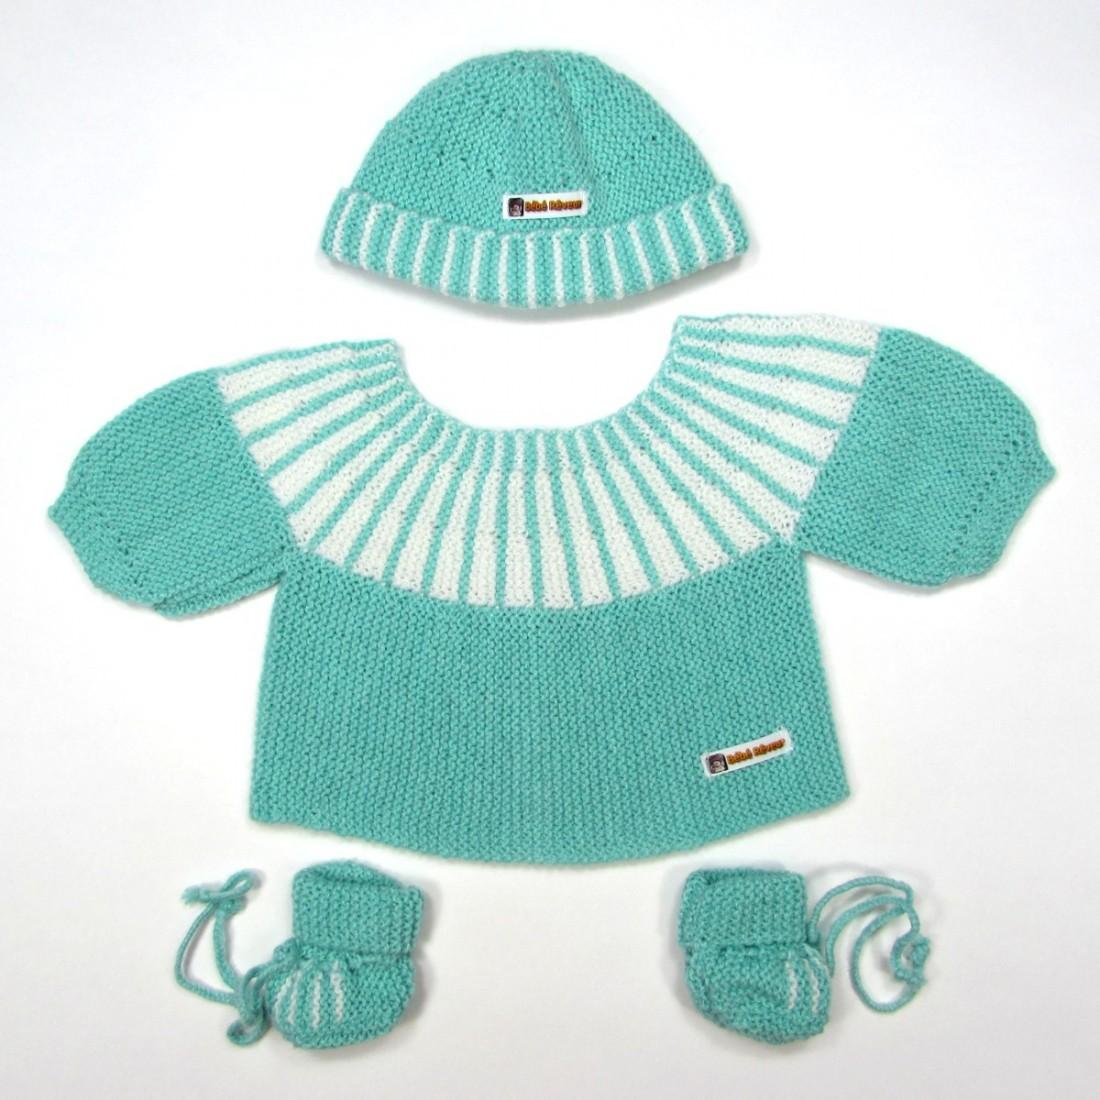 Ensemble tricot layette naissance bébé garçon vert rayé blanc